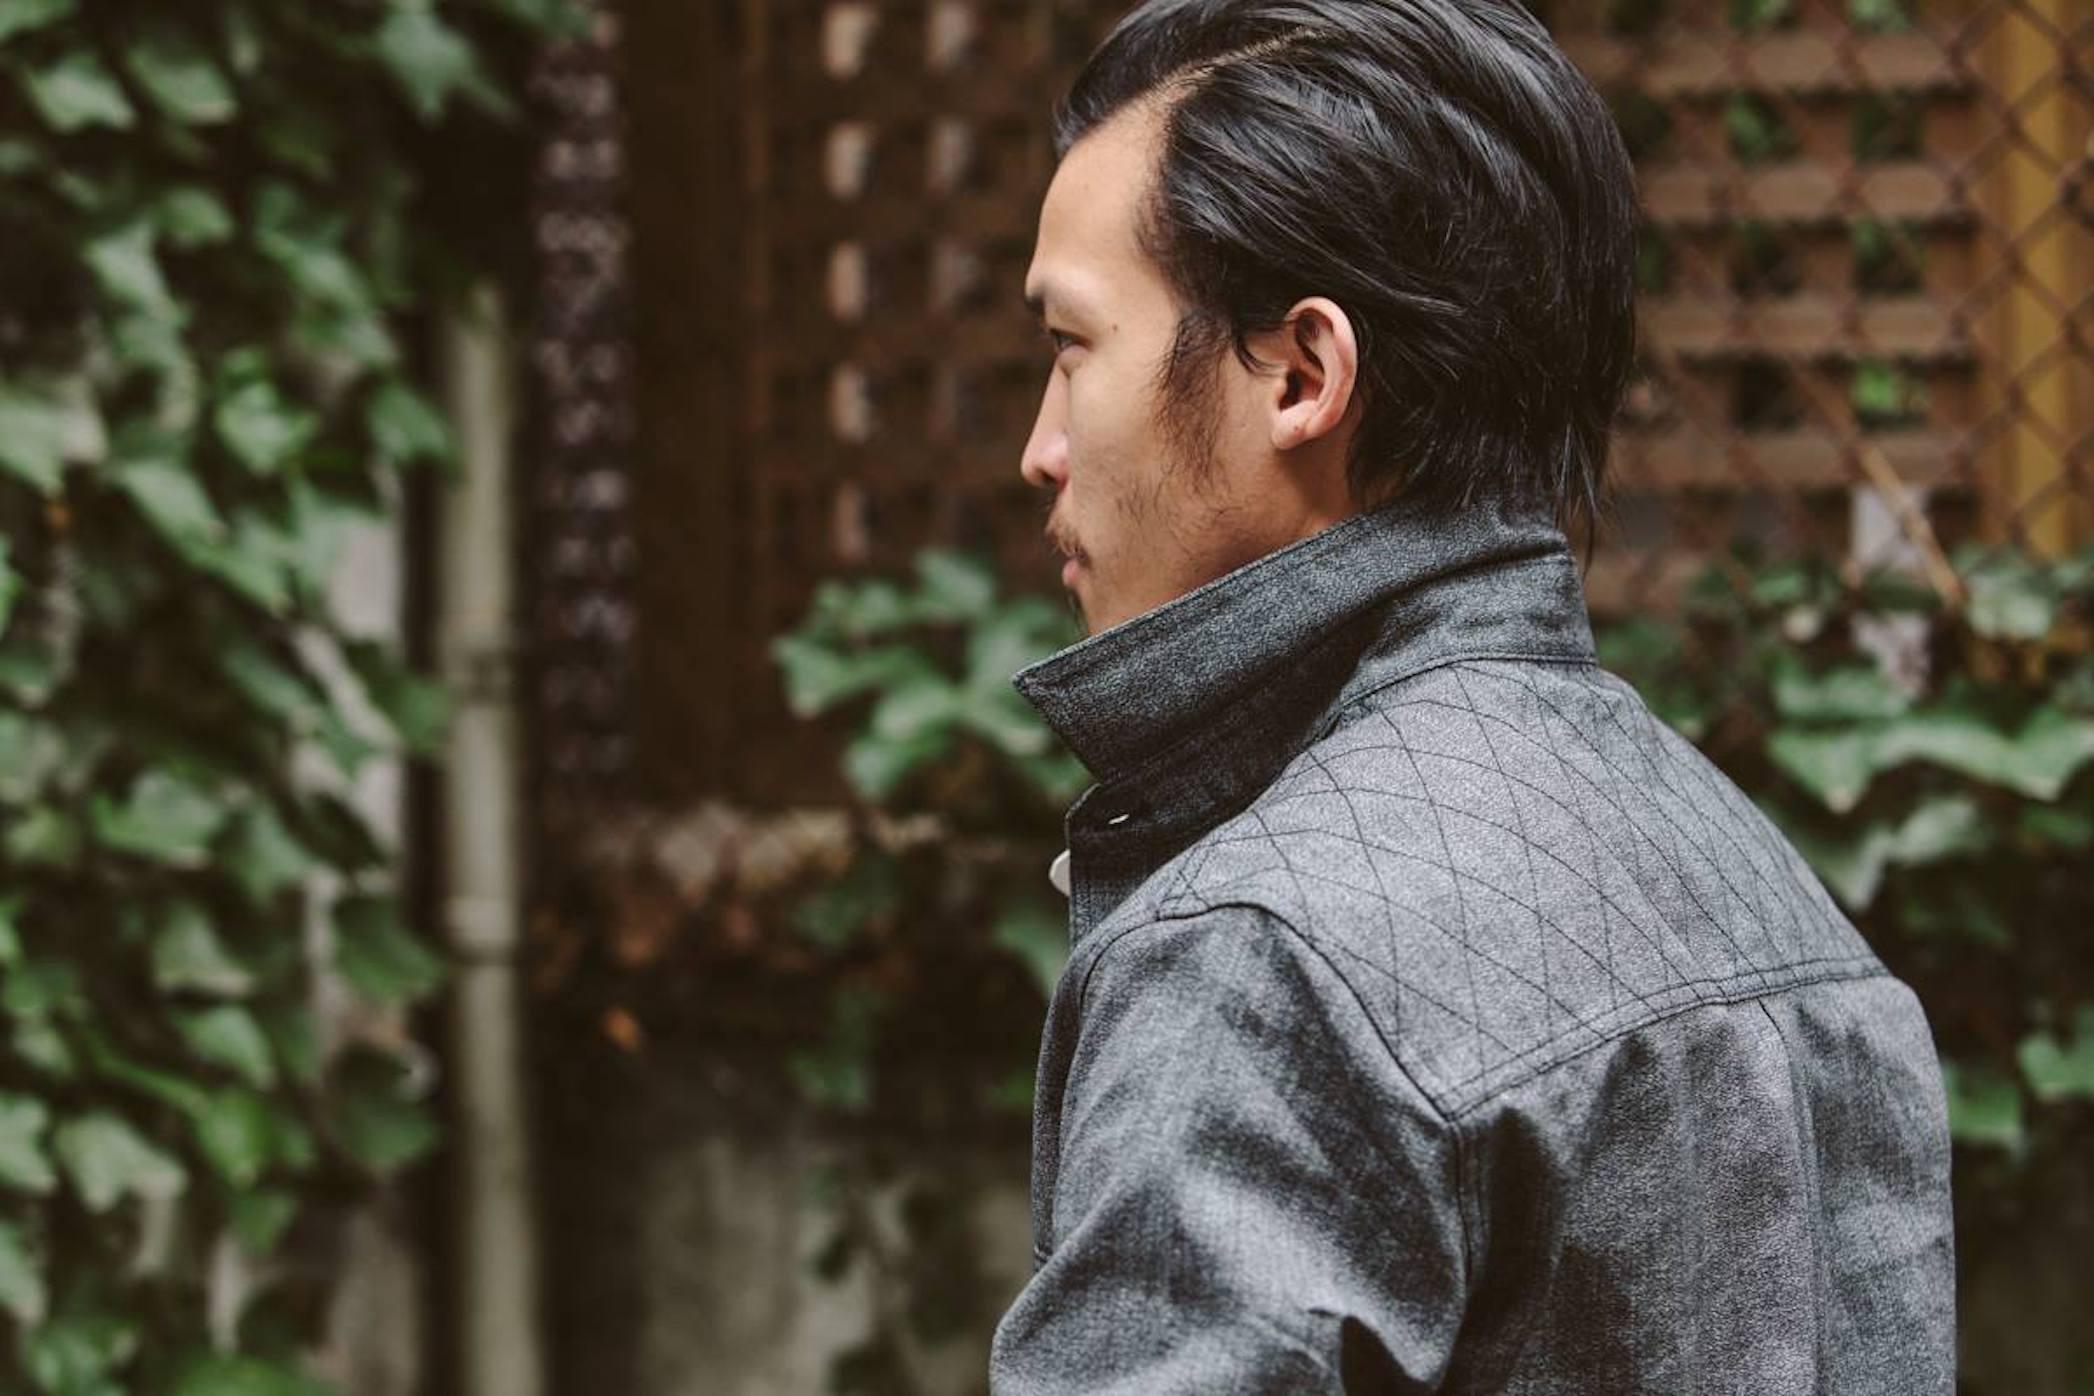 Singapore fashion labels: Biro